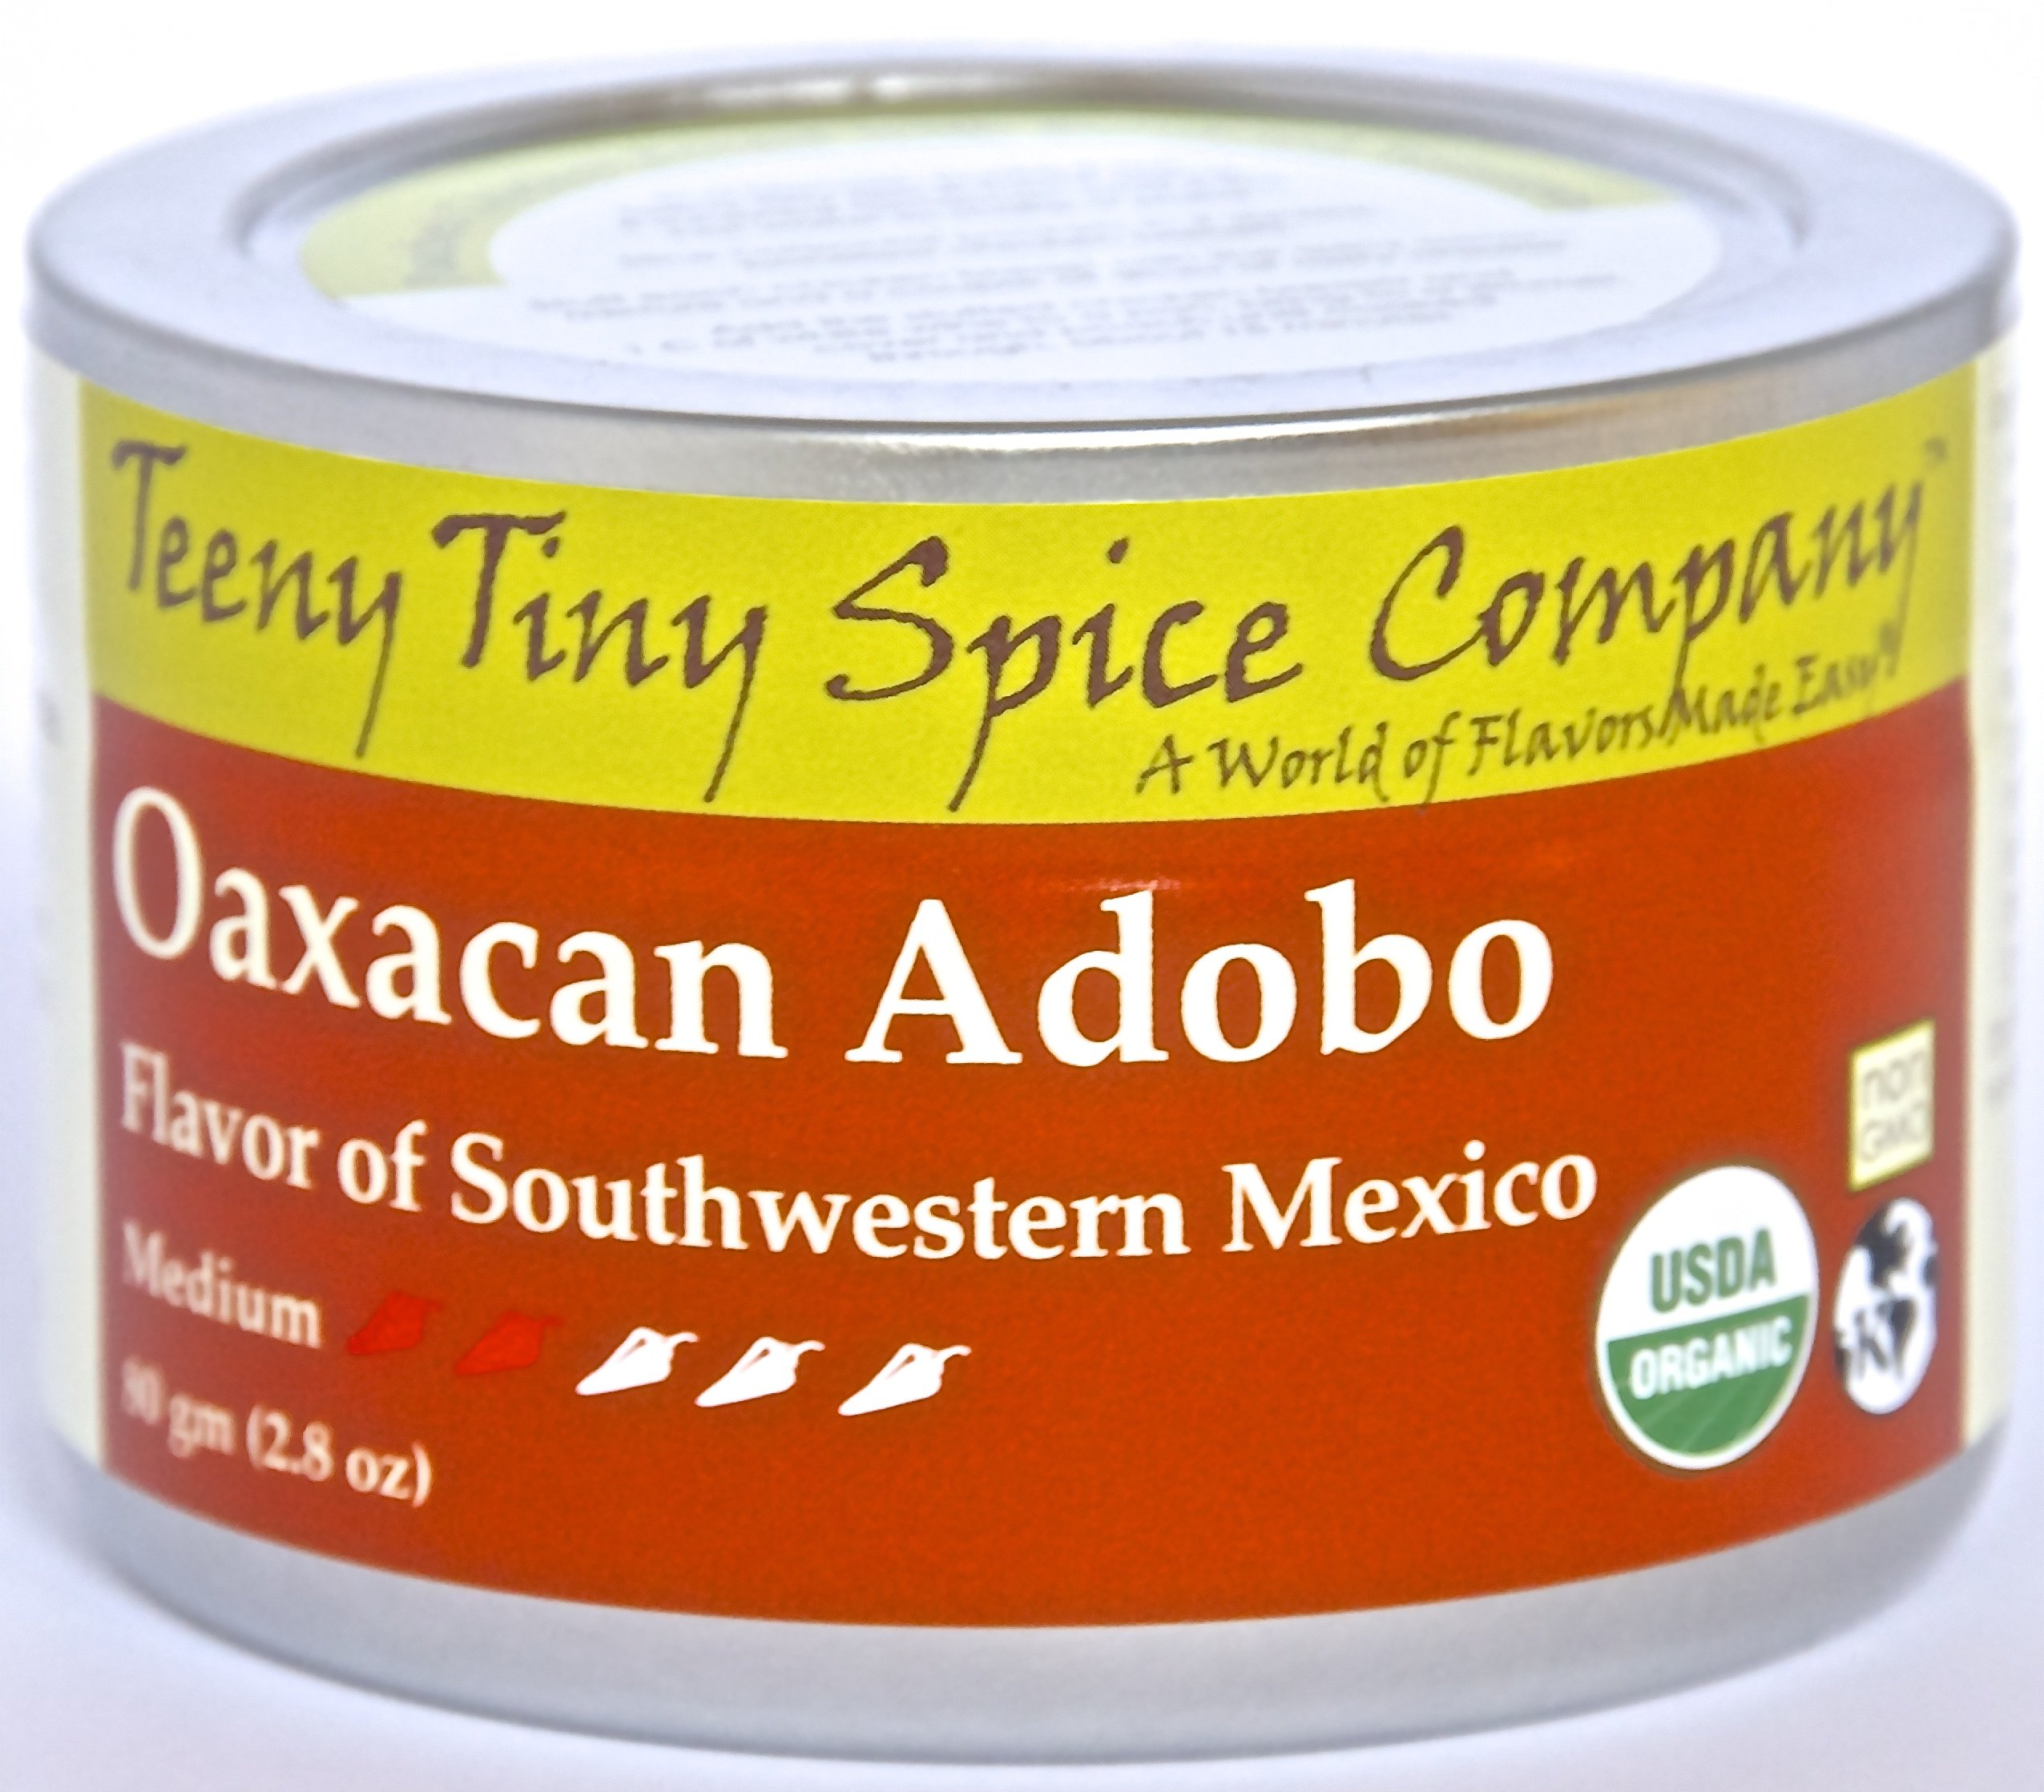 Teeny Tiny Spice Co. of Vermont Organic Oaxacan Adobo-- 2.8 oz